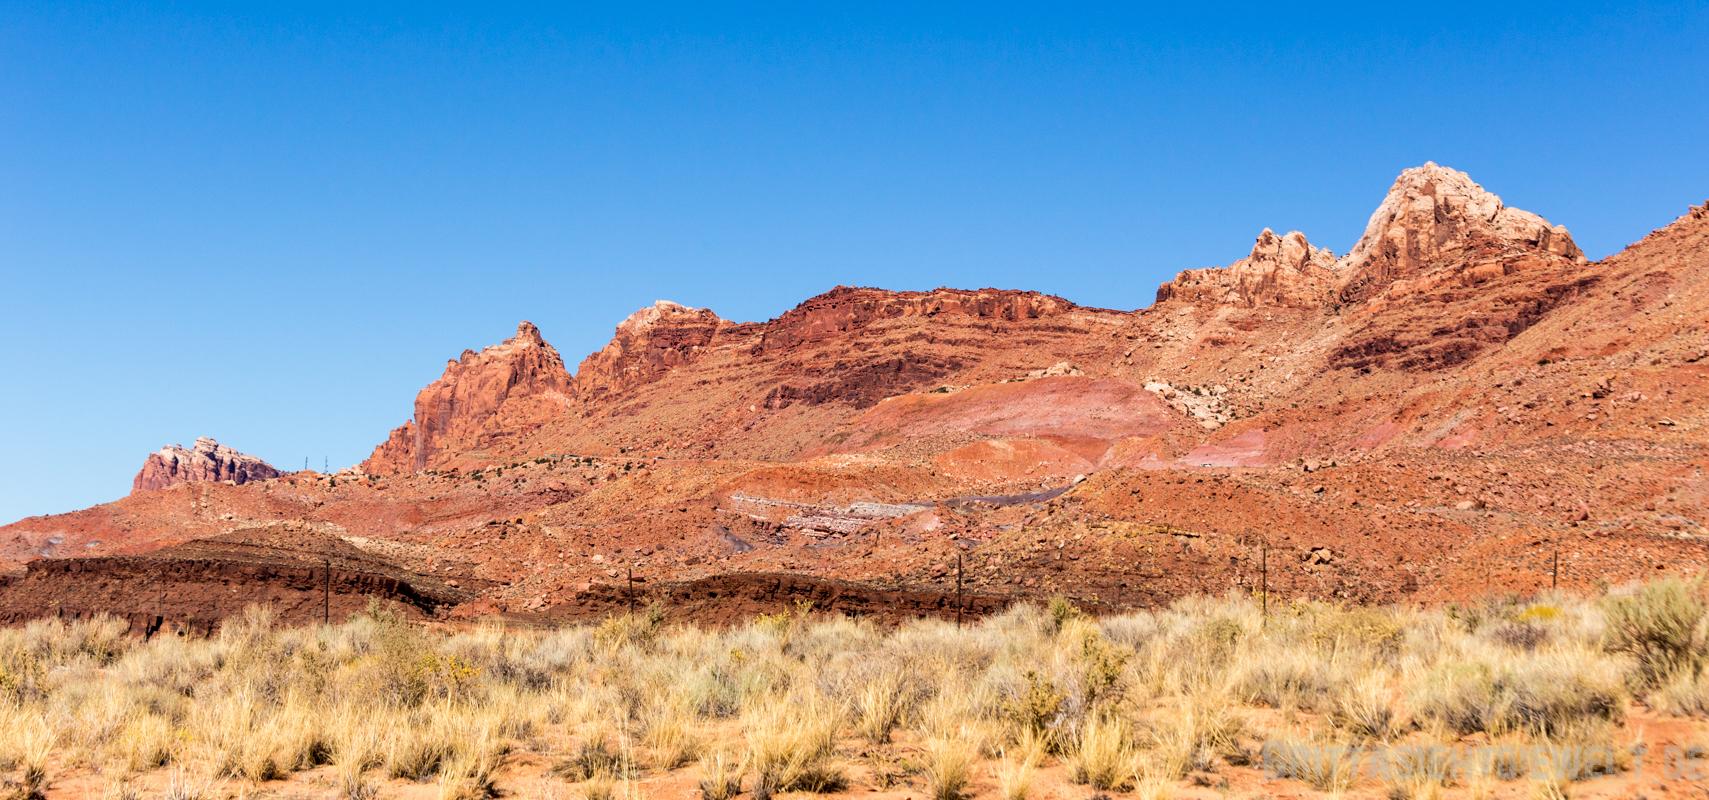 Landschaft,landscape,berge,rote,felsen,tipps,herbst,oktober,usa,südwesten,rundreise,camper,jucy,campervan,arizona